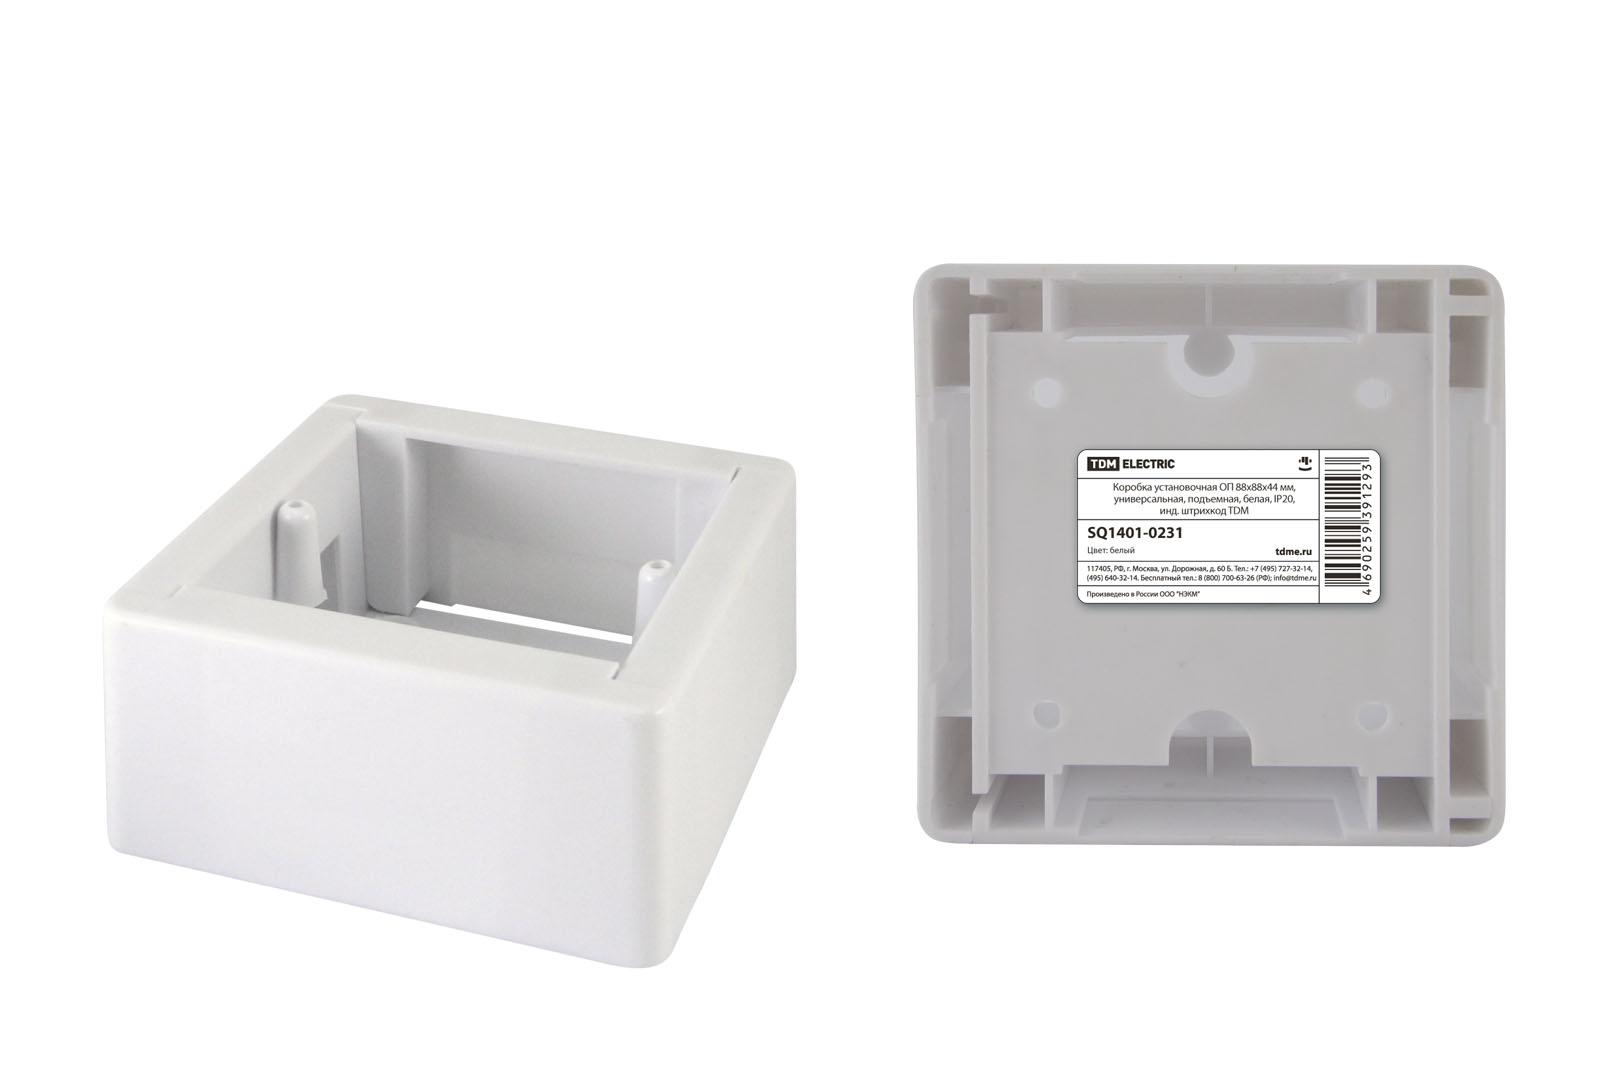 Фото Коробка установочная ОП 88х88х44 мм, универсальная, подъемная, белая, IP20, инд. штрихкод TDM {SQ1401-0231}